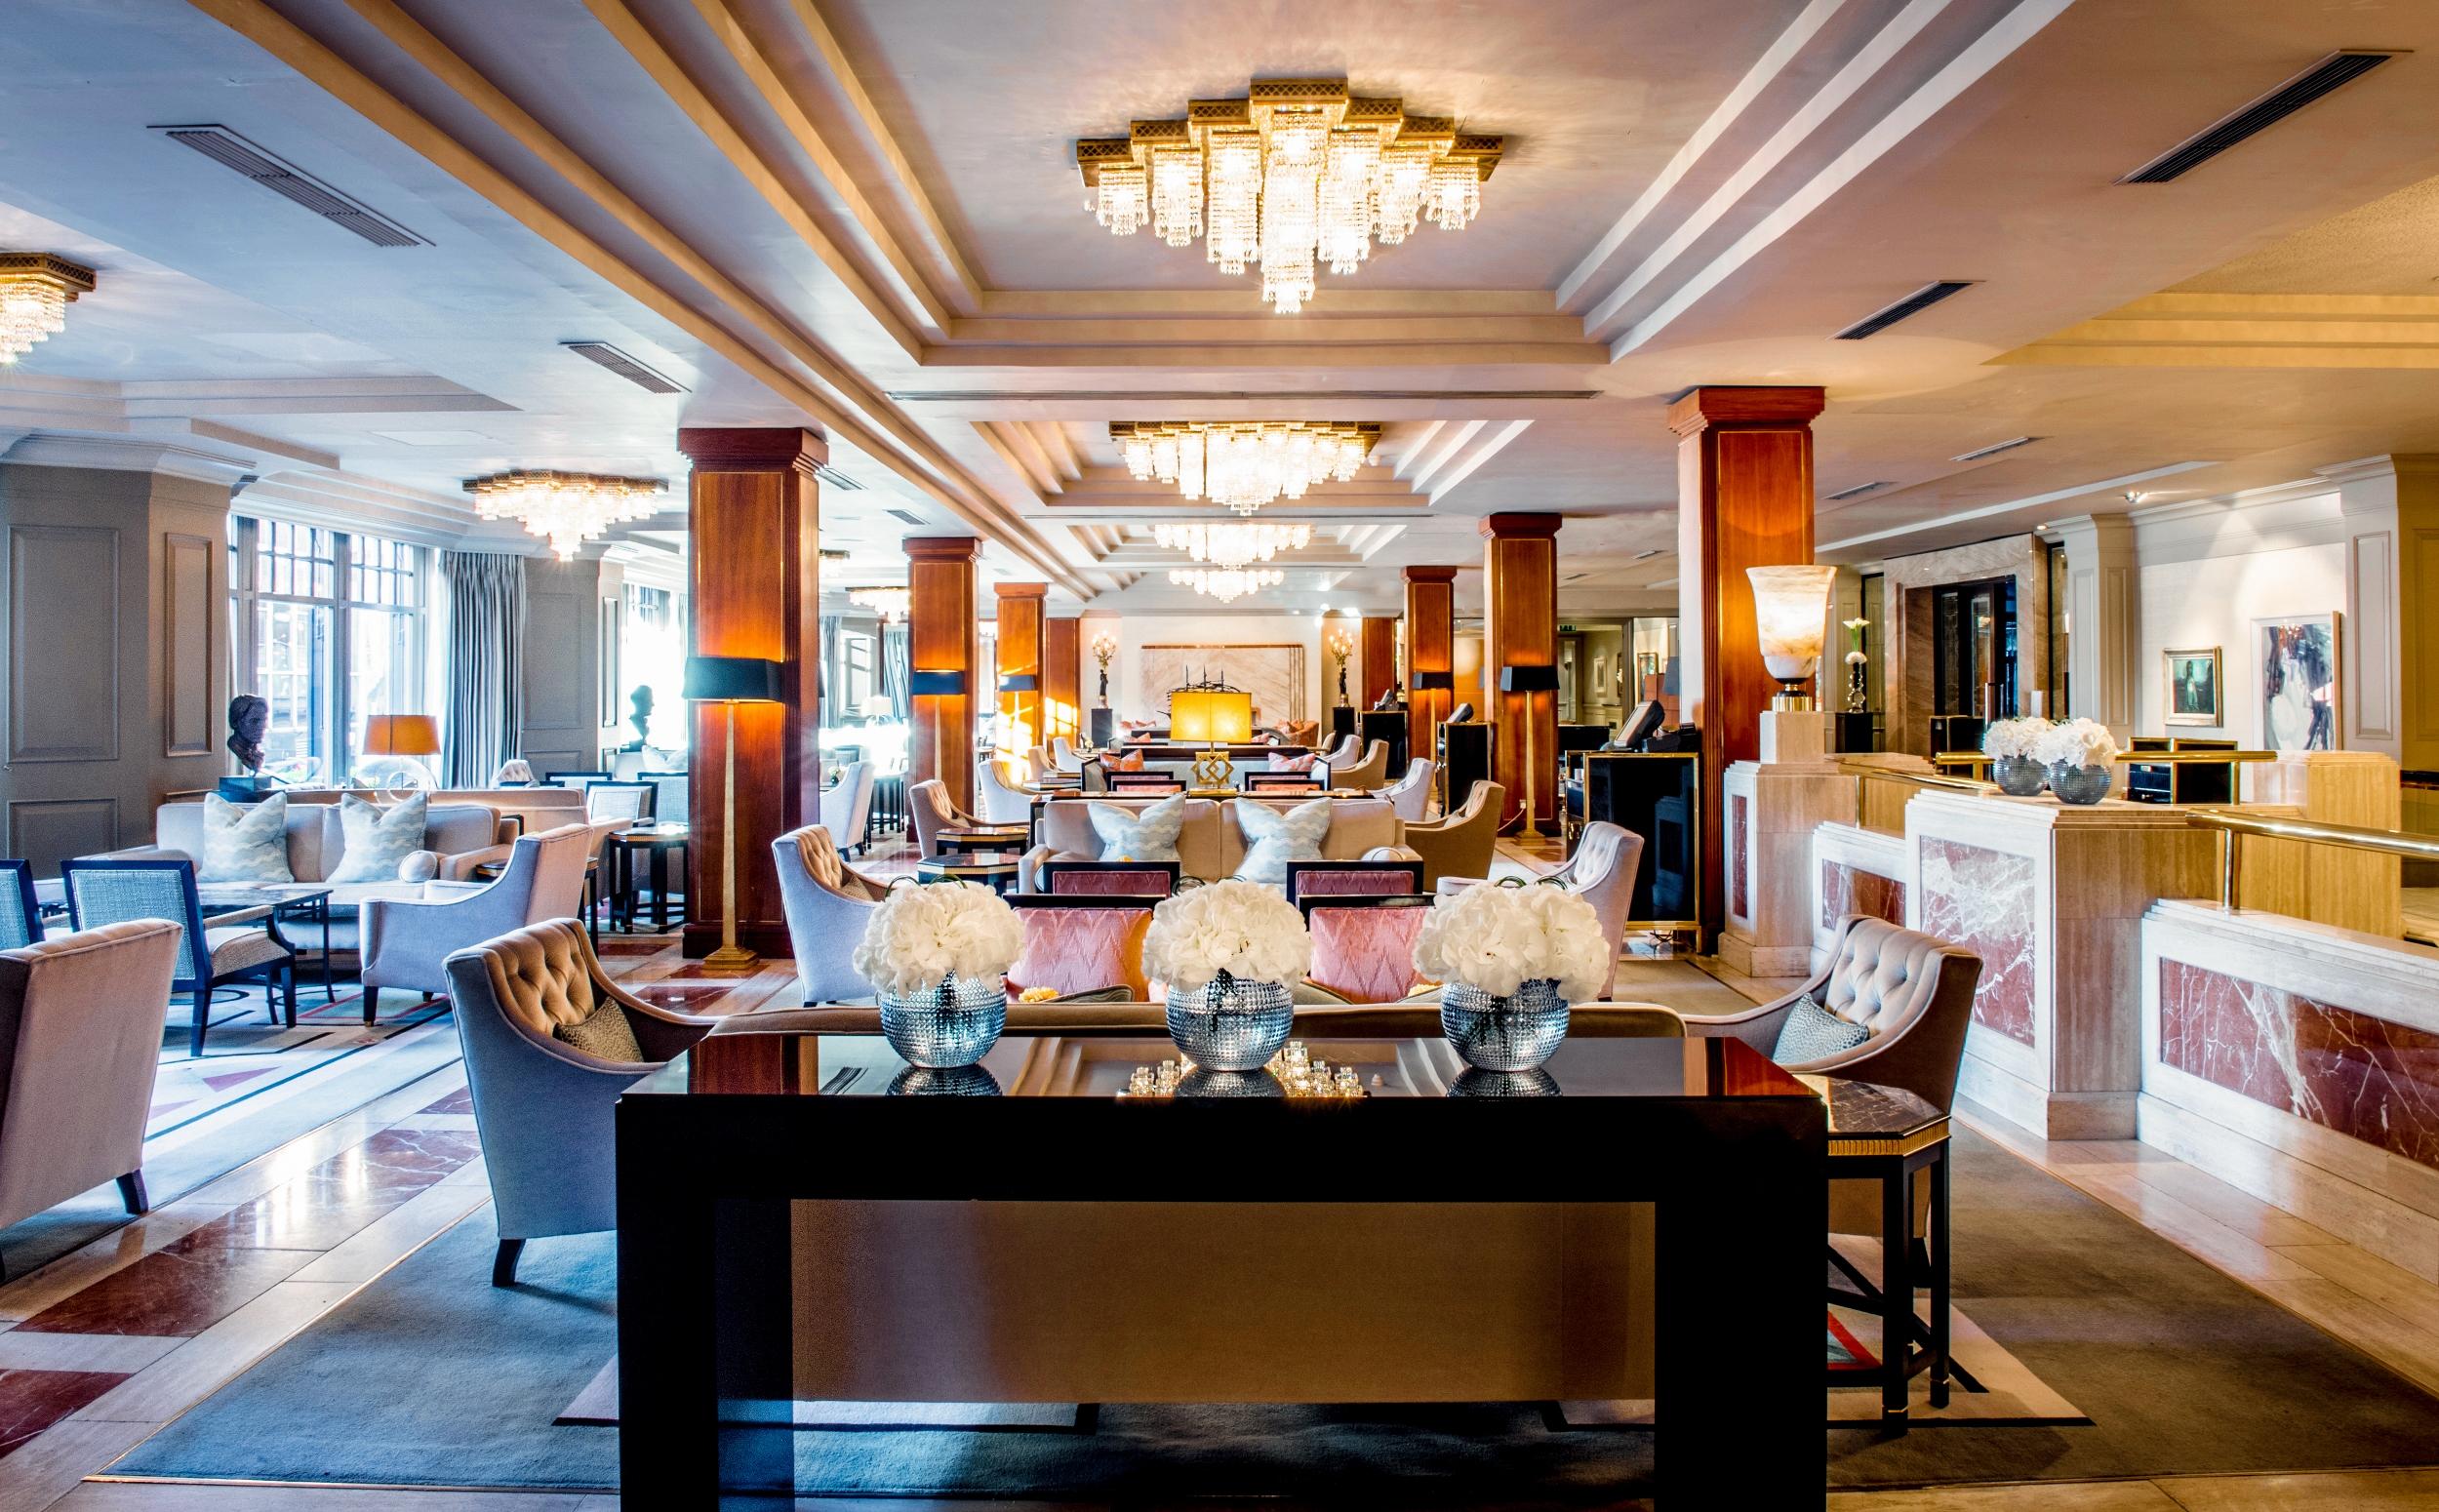 Ociated Luxury Hotels International Alhi Expands Portfolio With The Doyle Collection S 8 In England Ireland Washington D C